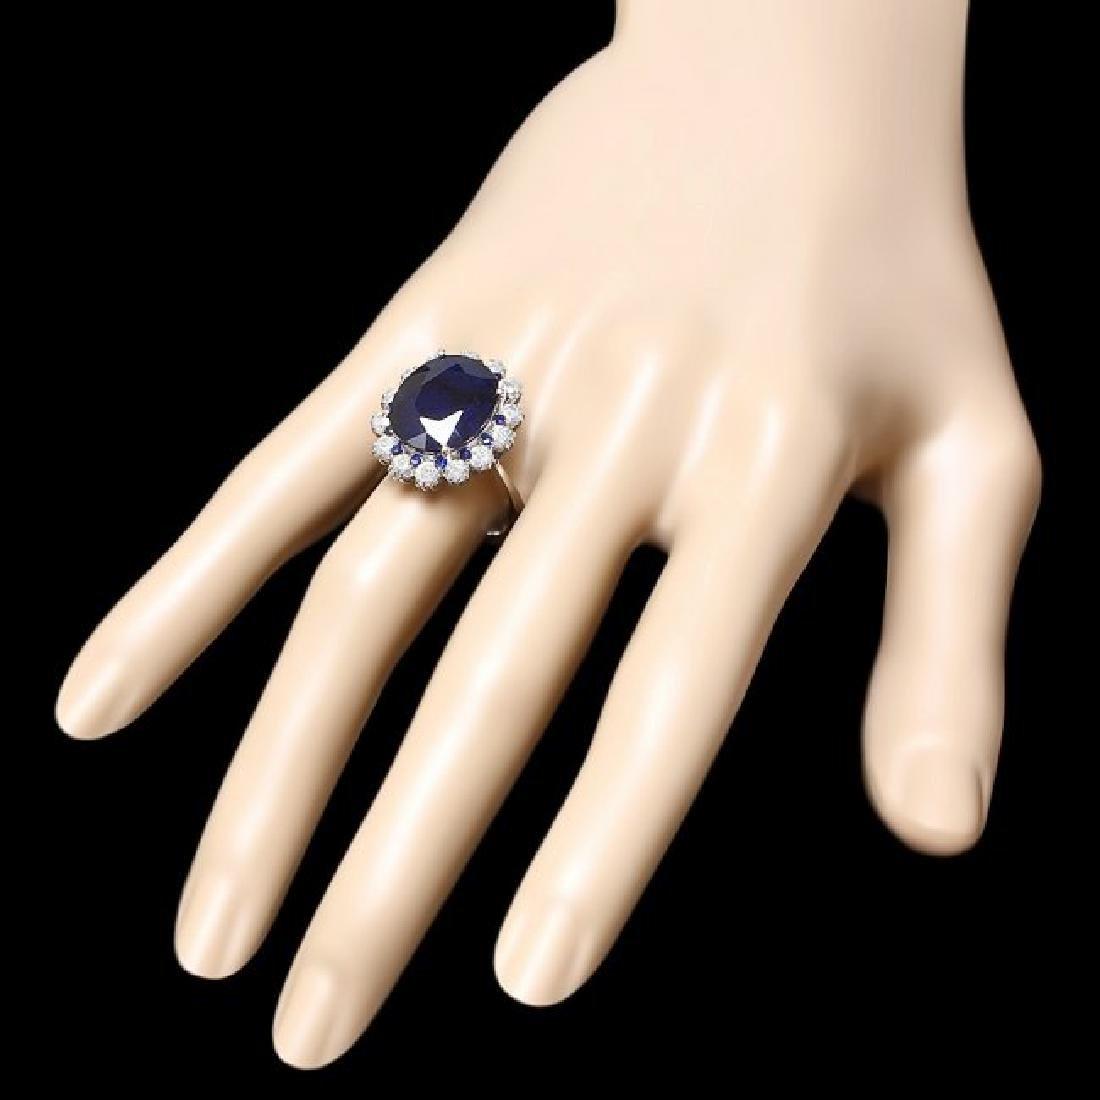 14k Gold 11.5ct Sapphire 1.40ct Diamond Ring - 3